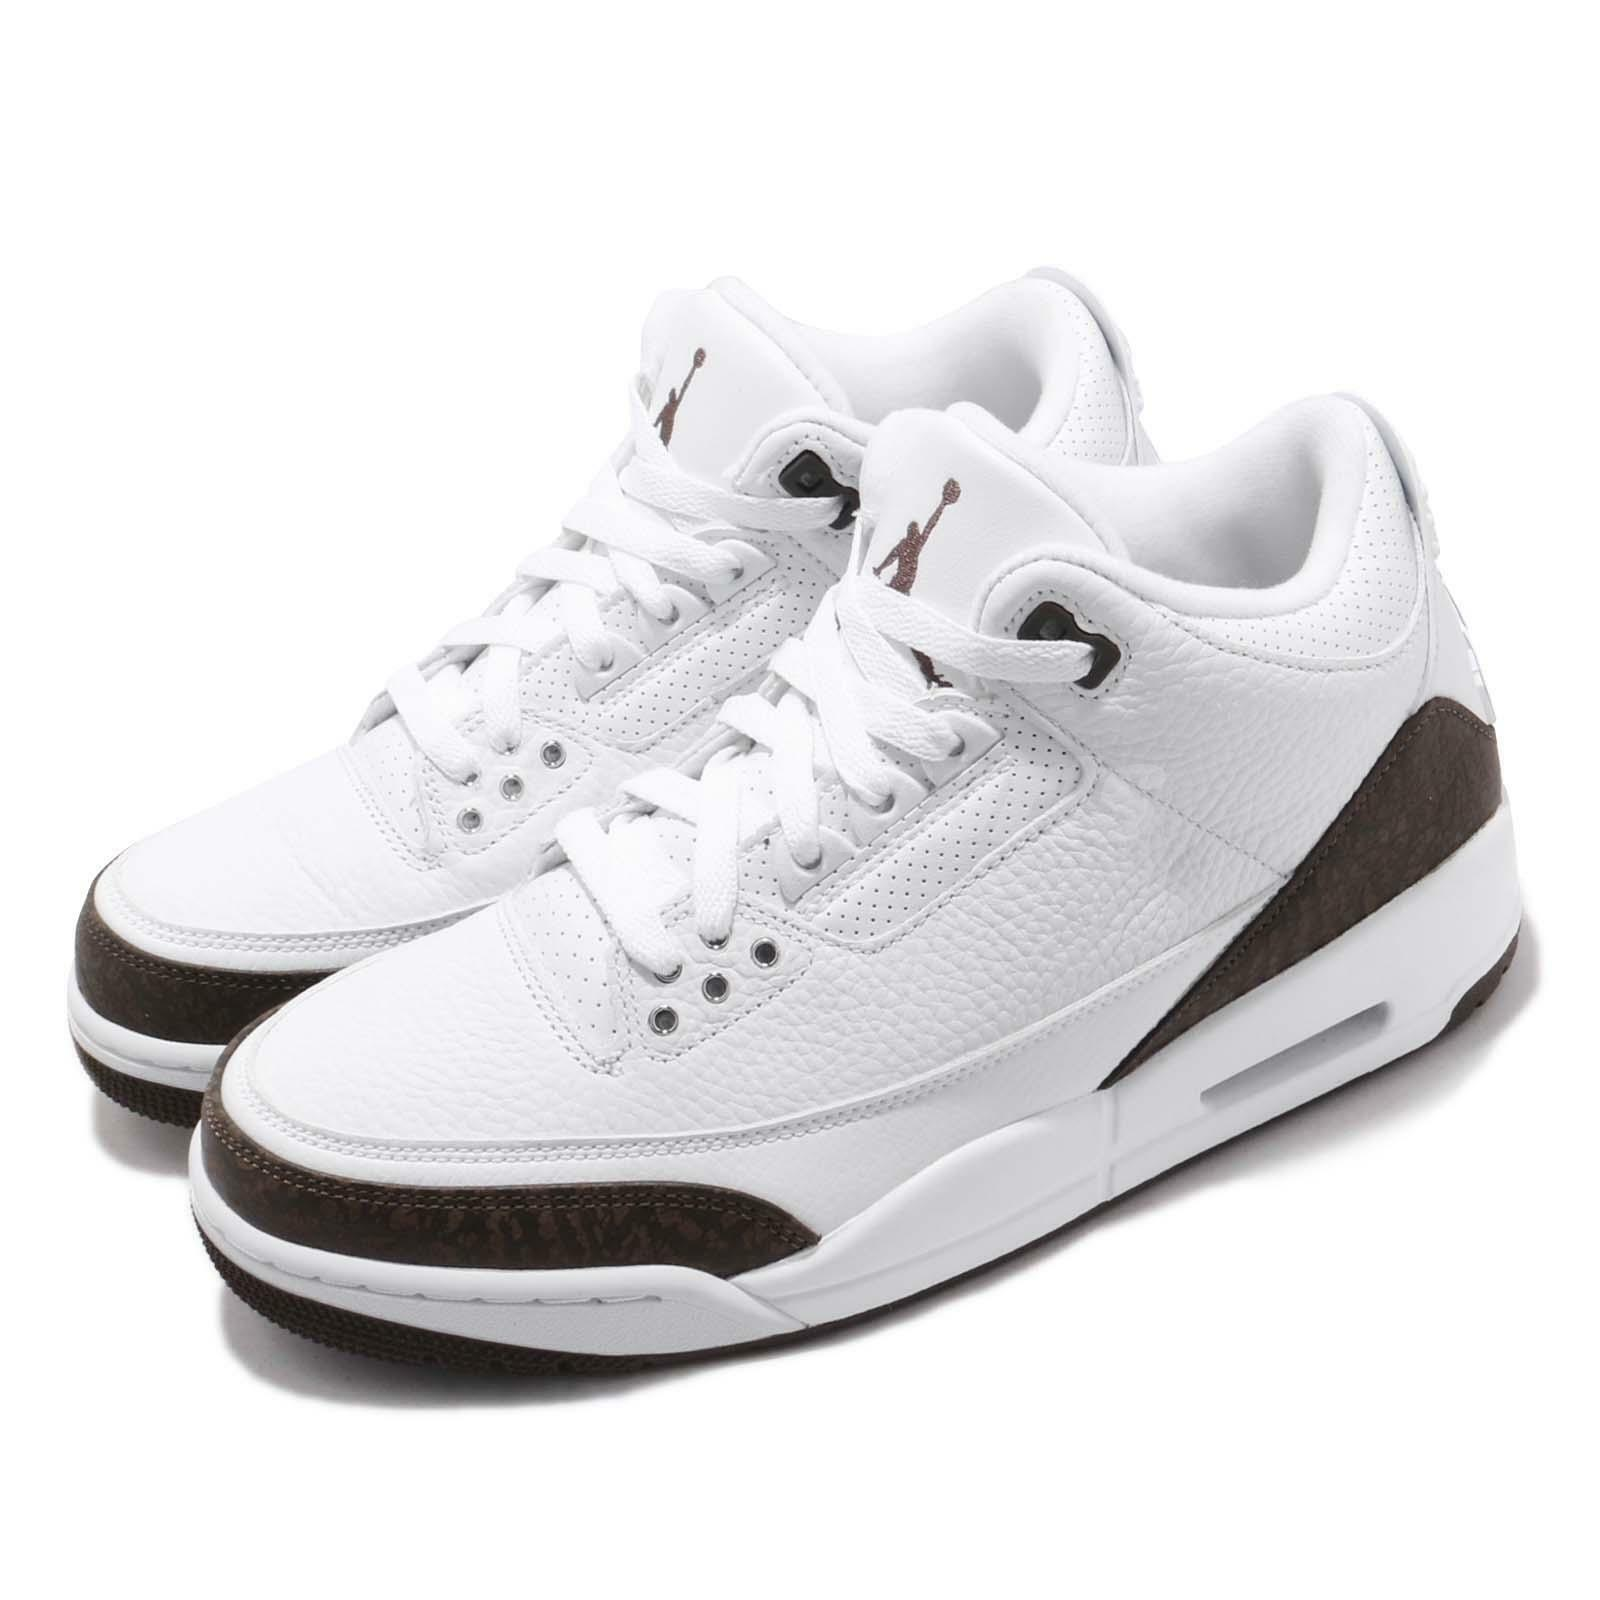 Nike Air Jordan 3 Retro Mocha 2018 III AJ3 White White White Men Basketball shoes 136064-122 04837b